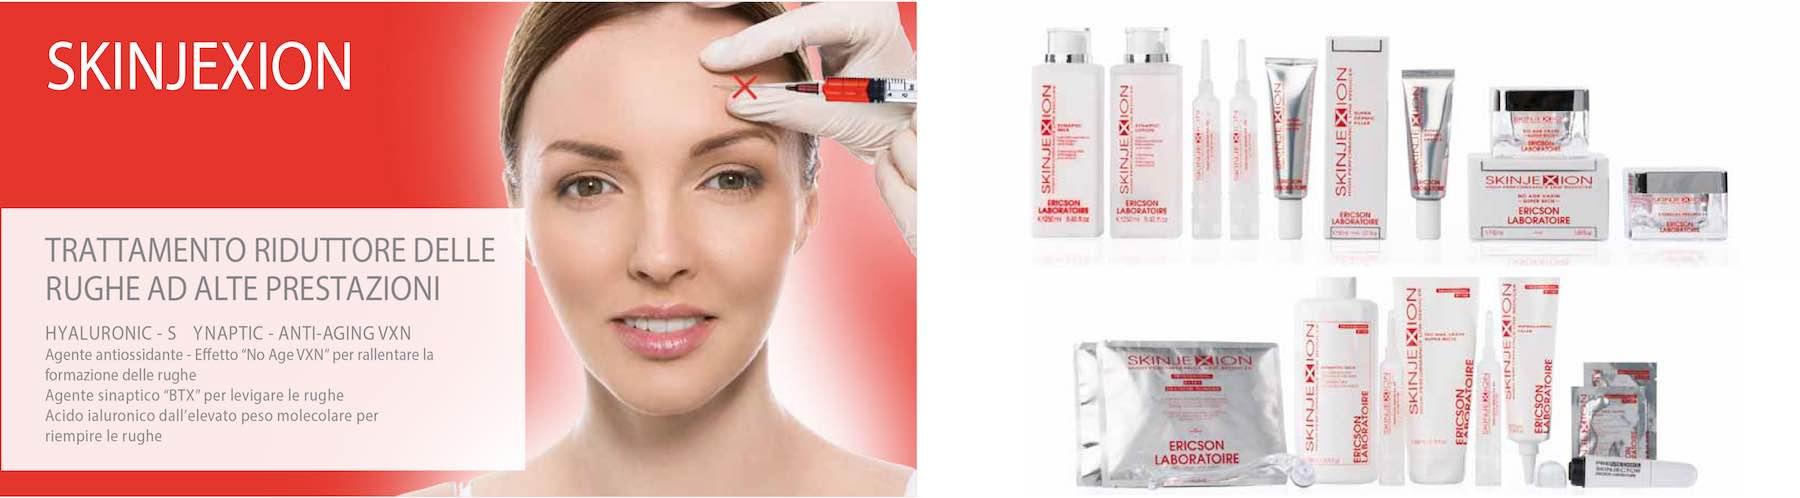 Jerà Beauty - Face-Ericson-Laboratoire-skinjexion